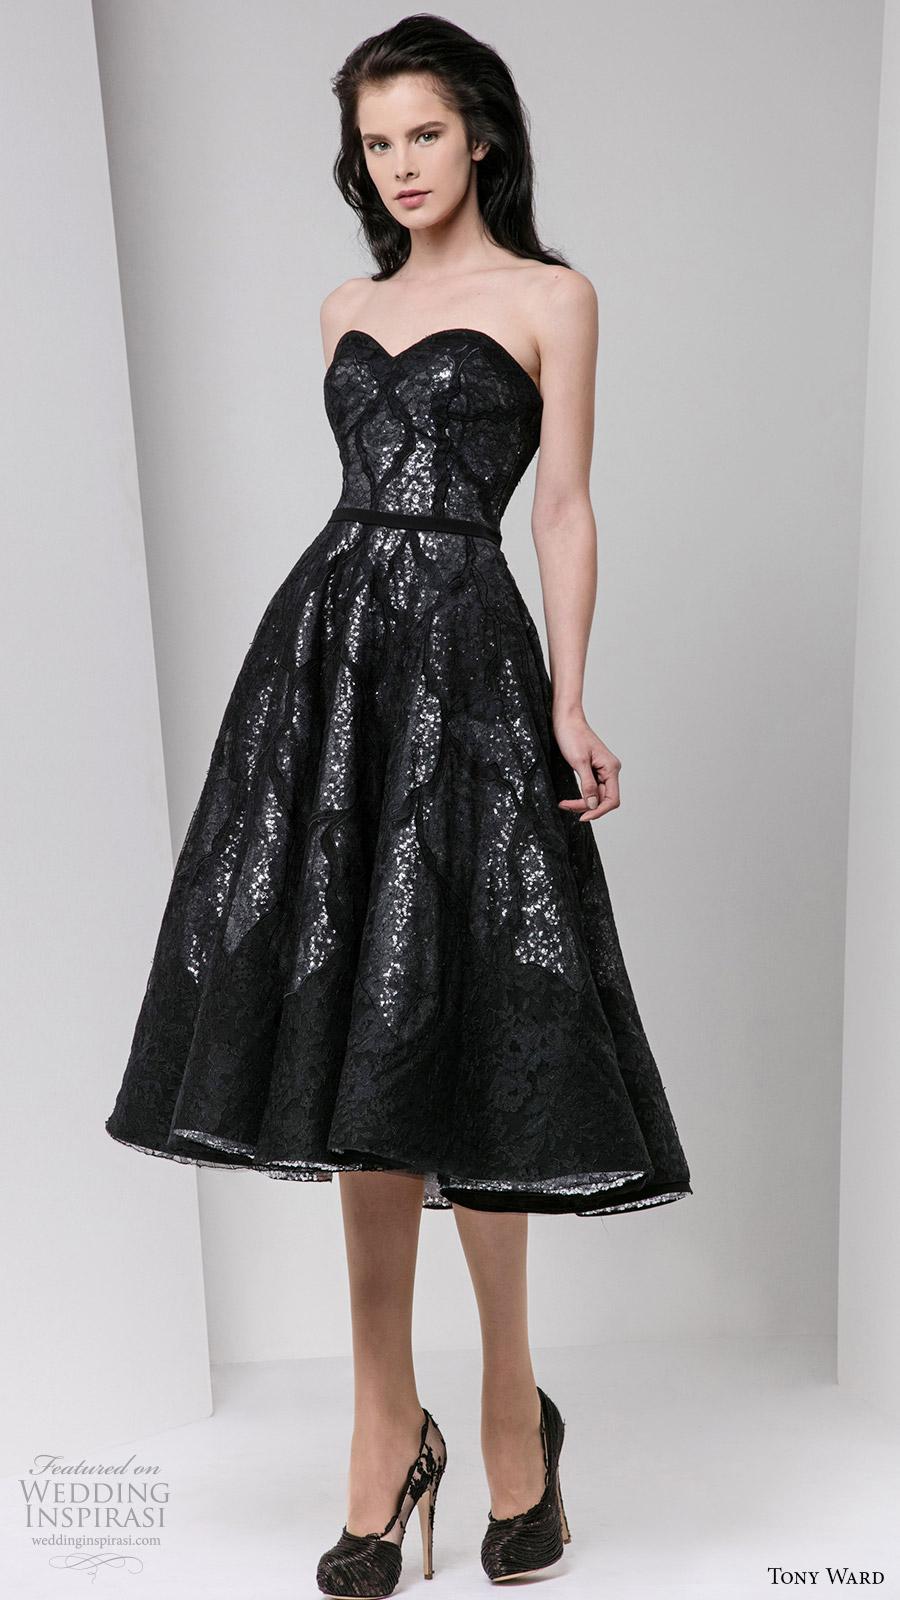 tony ward fall 2016 rtw strapless sweetheart a line short dress sequin black